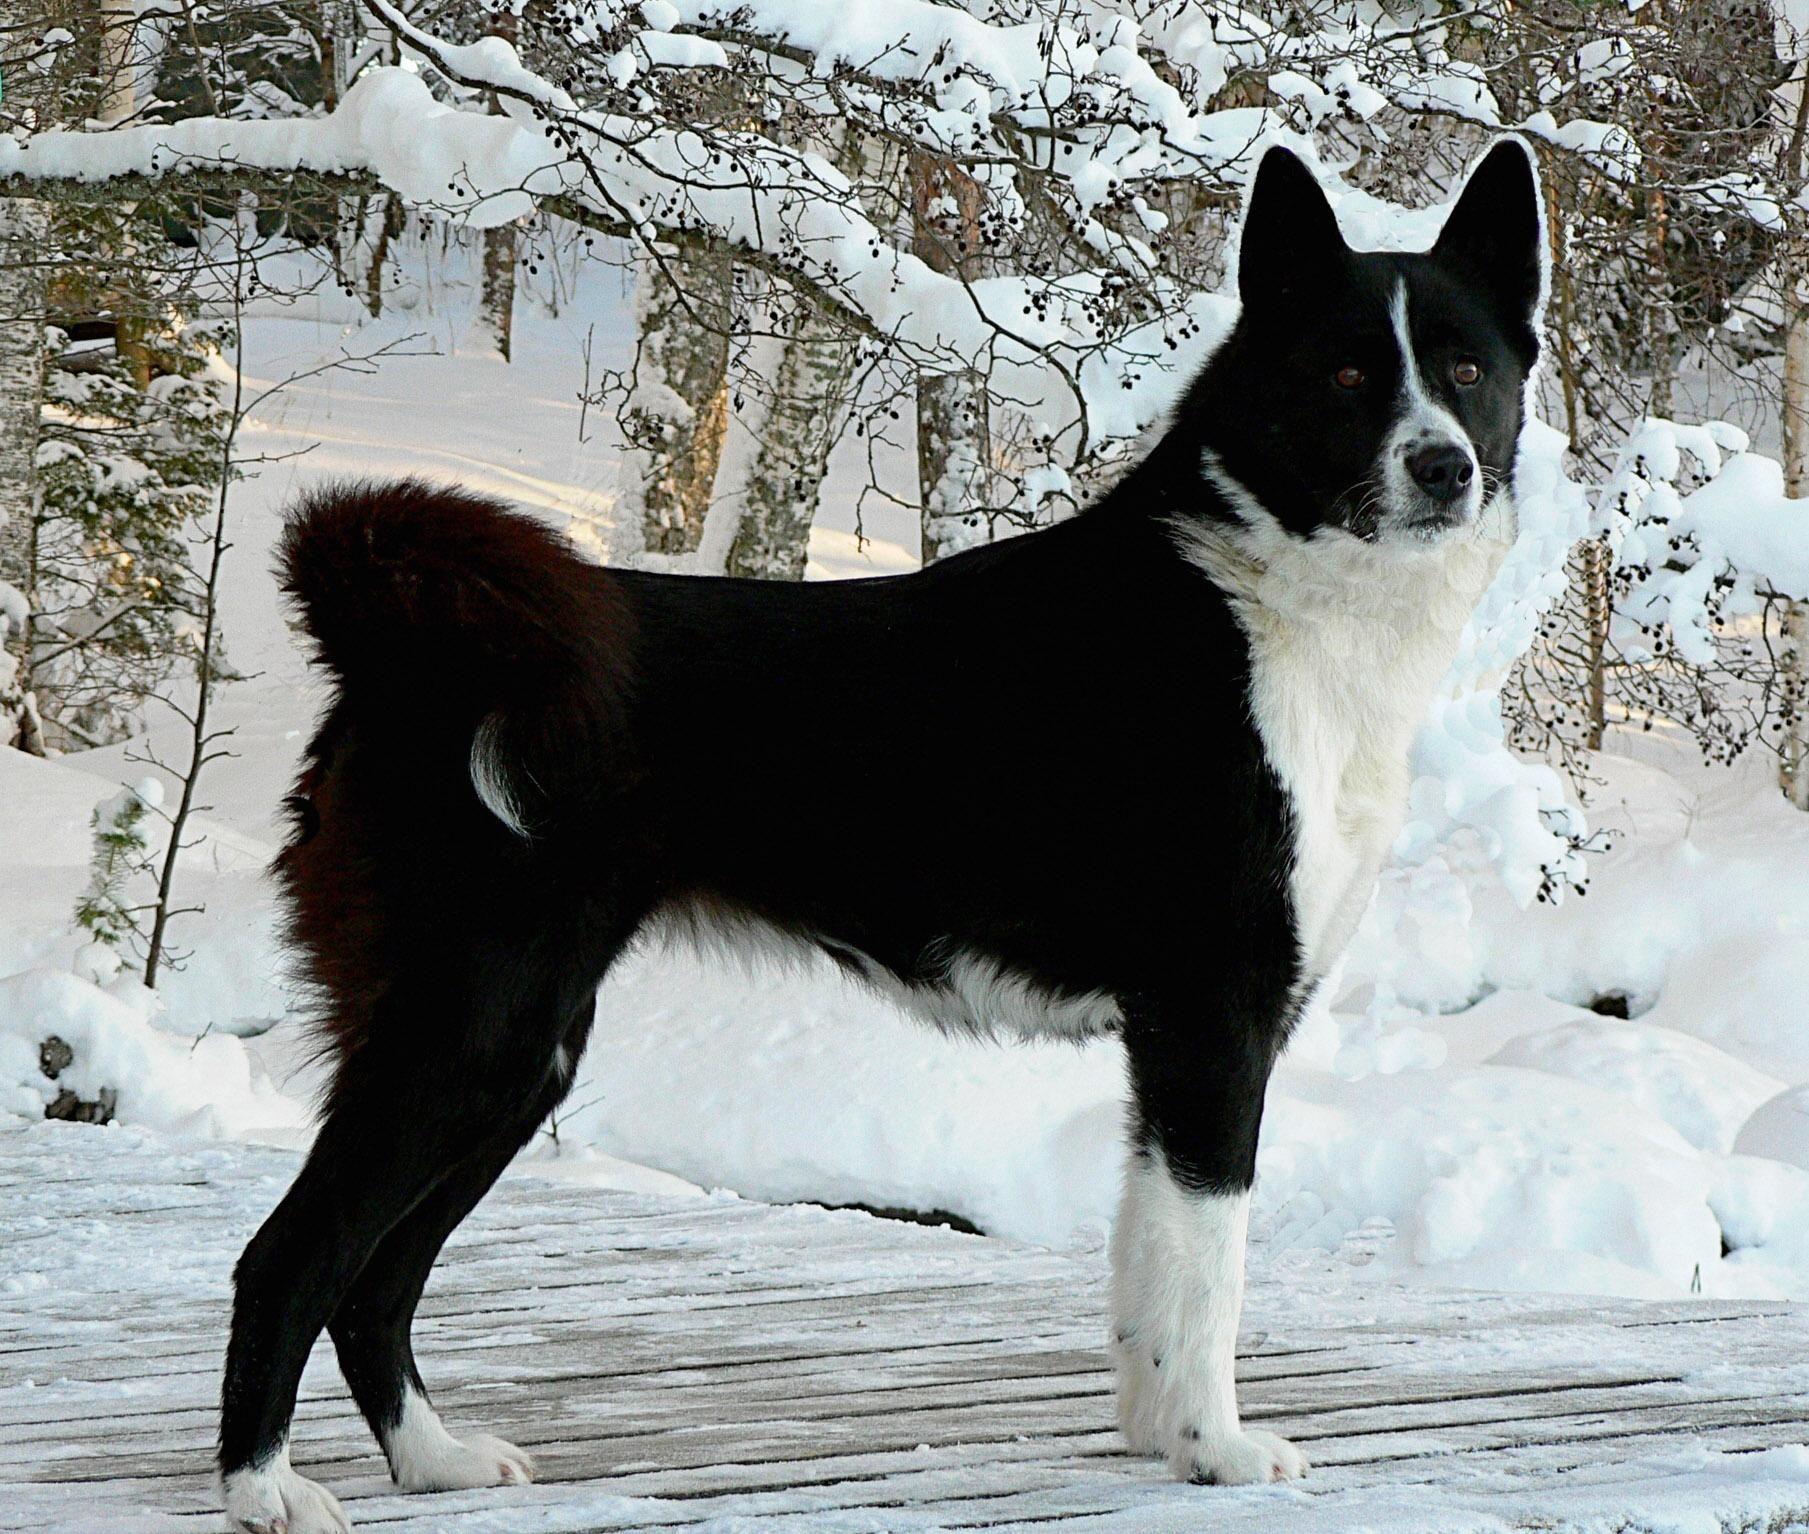 Pin Von B Bajai Auf Karjalankarhukoira Kareliai Mv Hunde Rassen Hunde Und Hunderassen